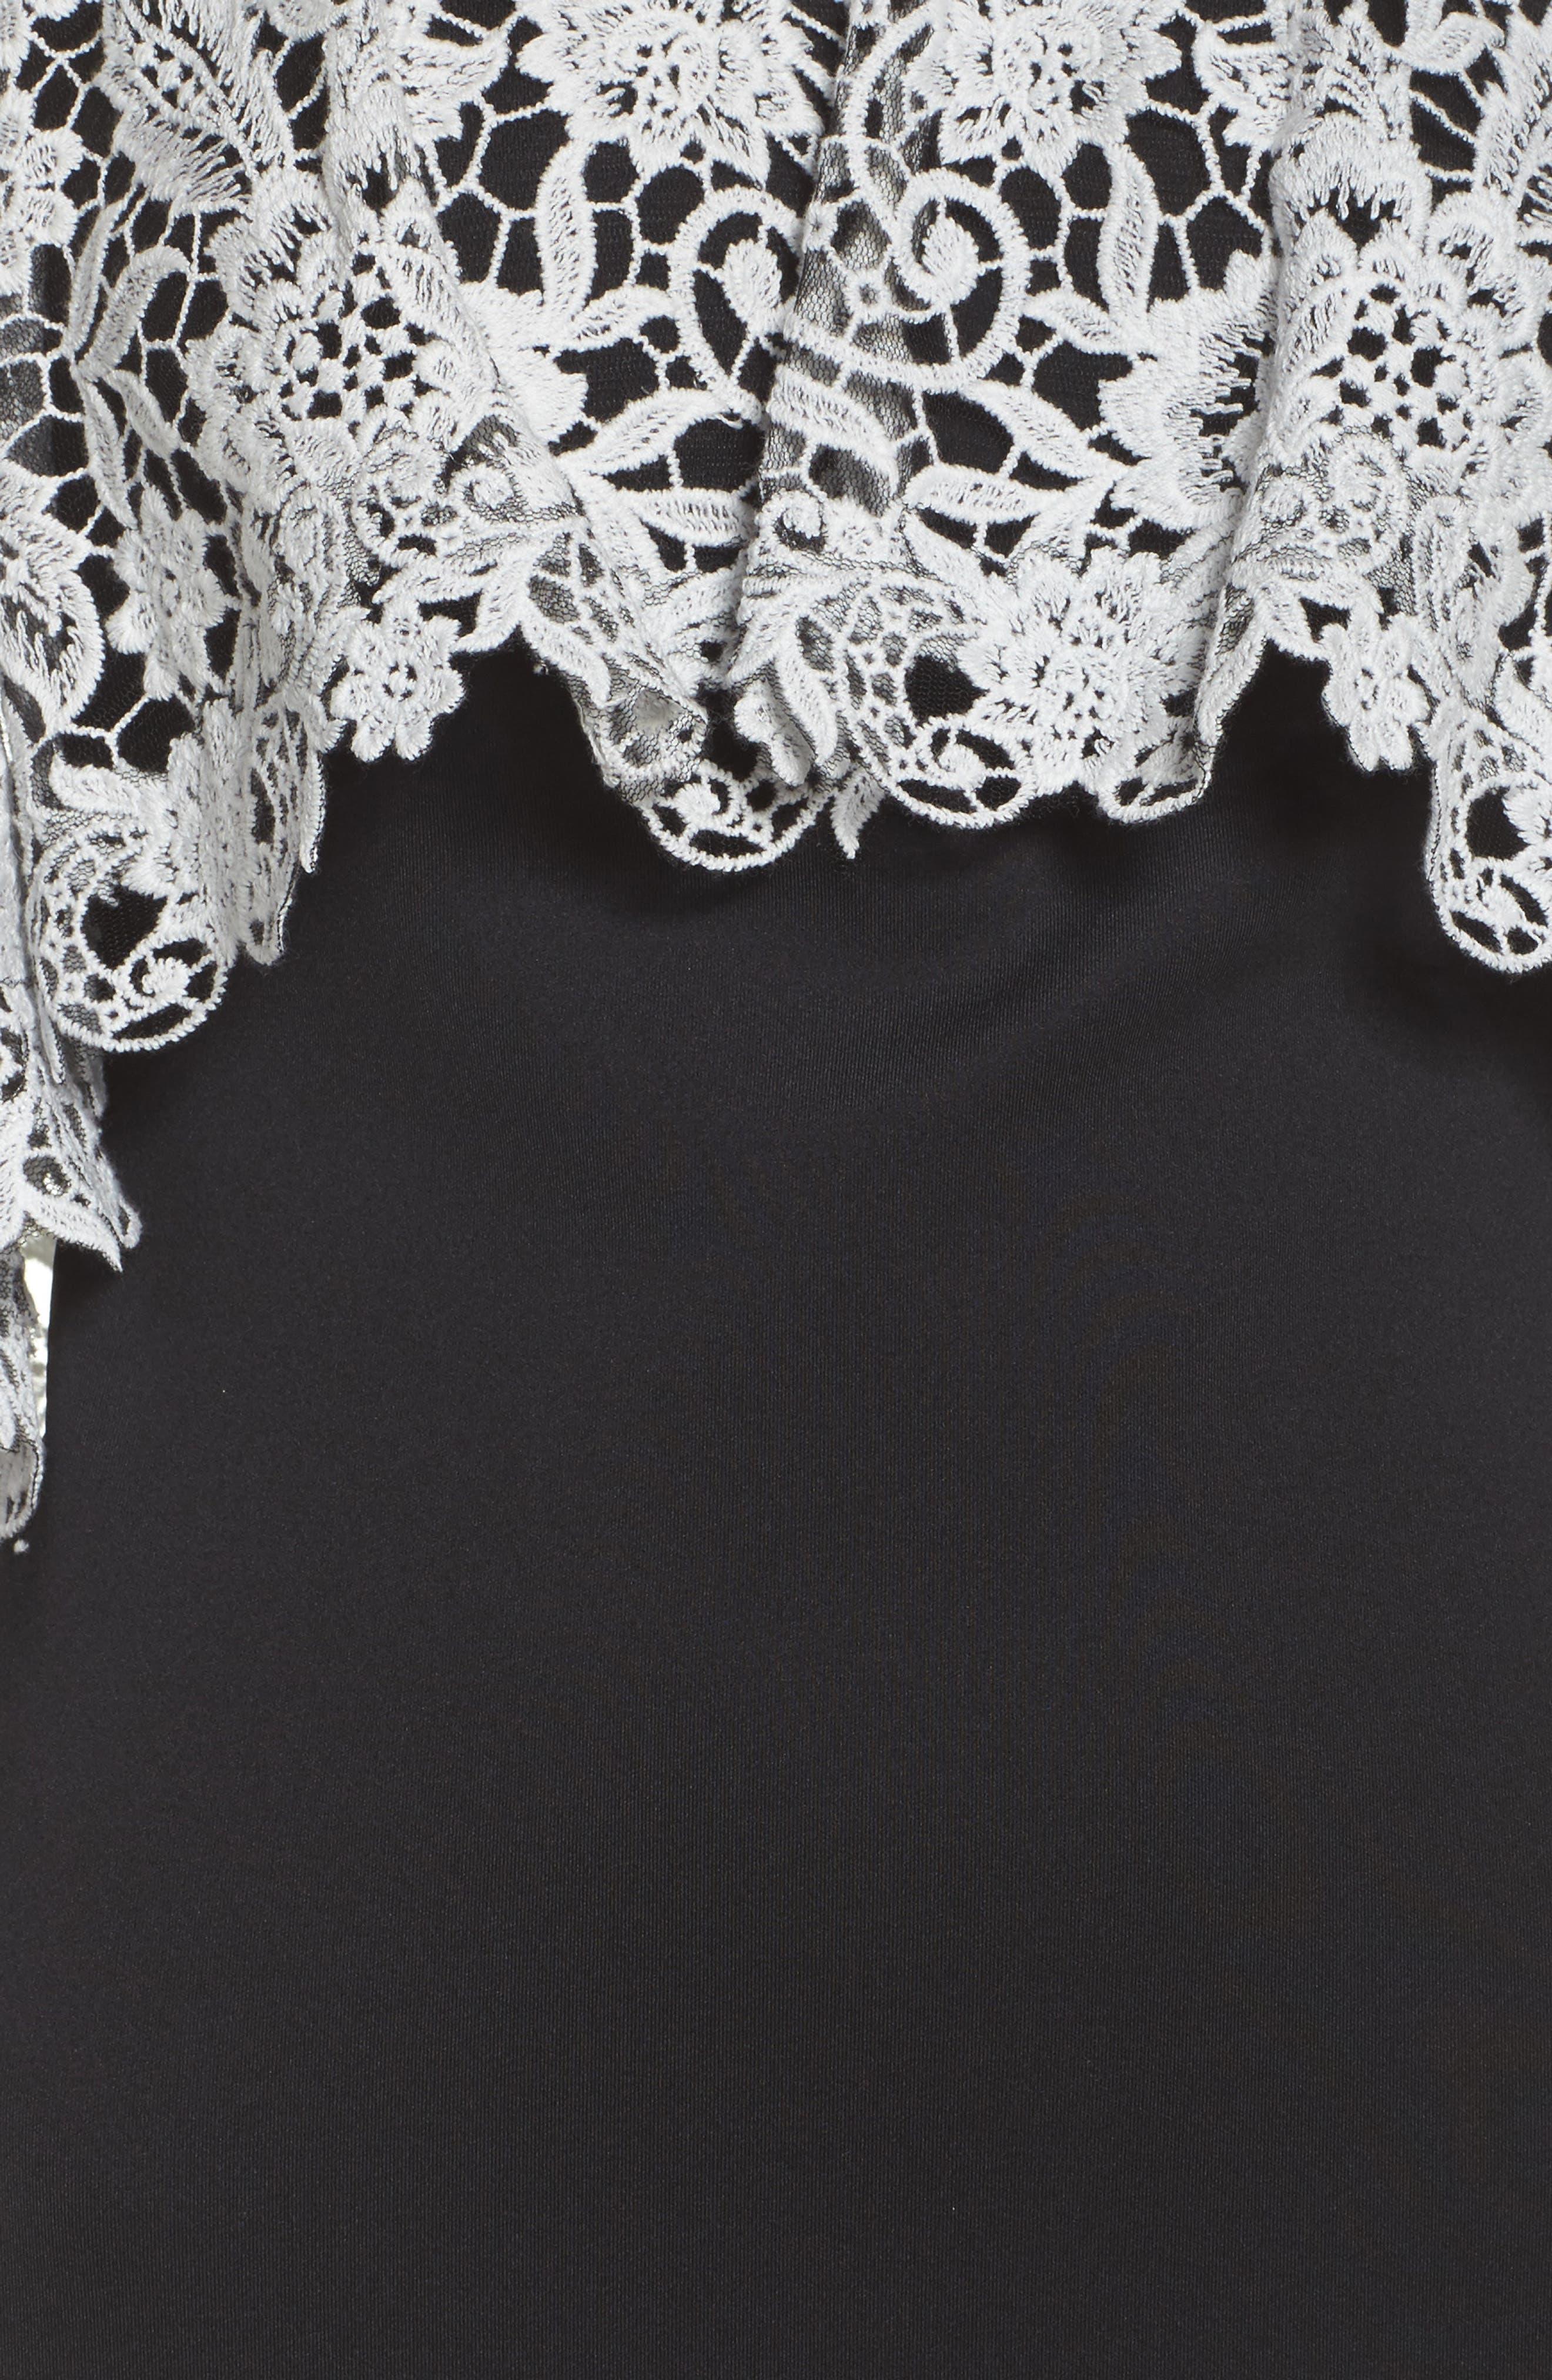 Illusion Neck Cape Dress,                             Alternate thumbnail 5, color,